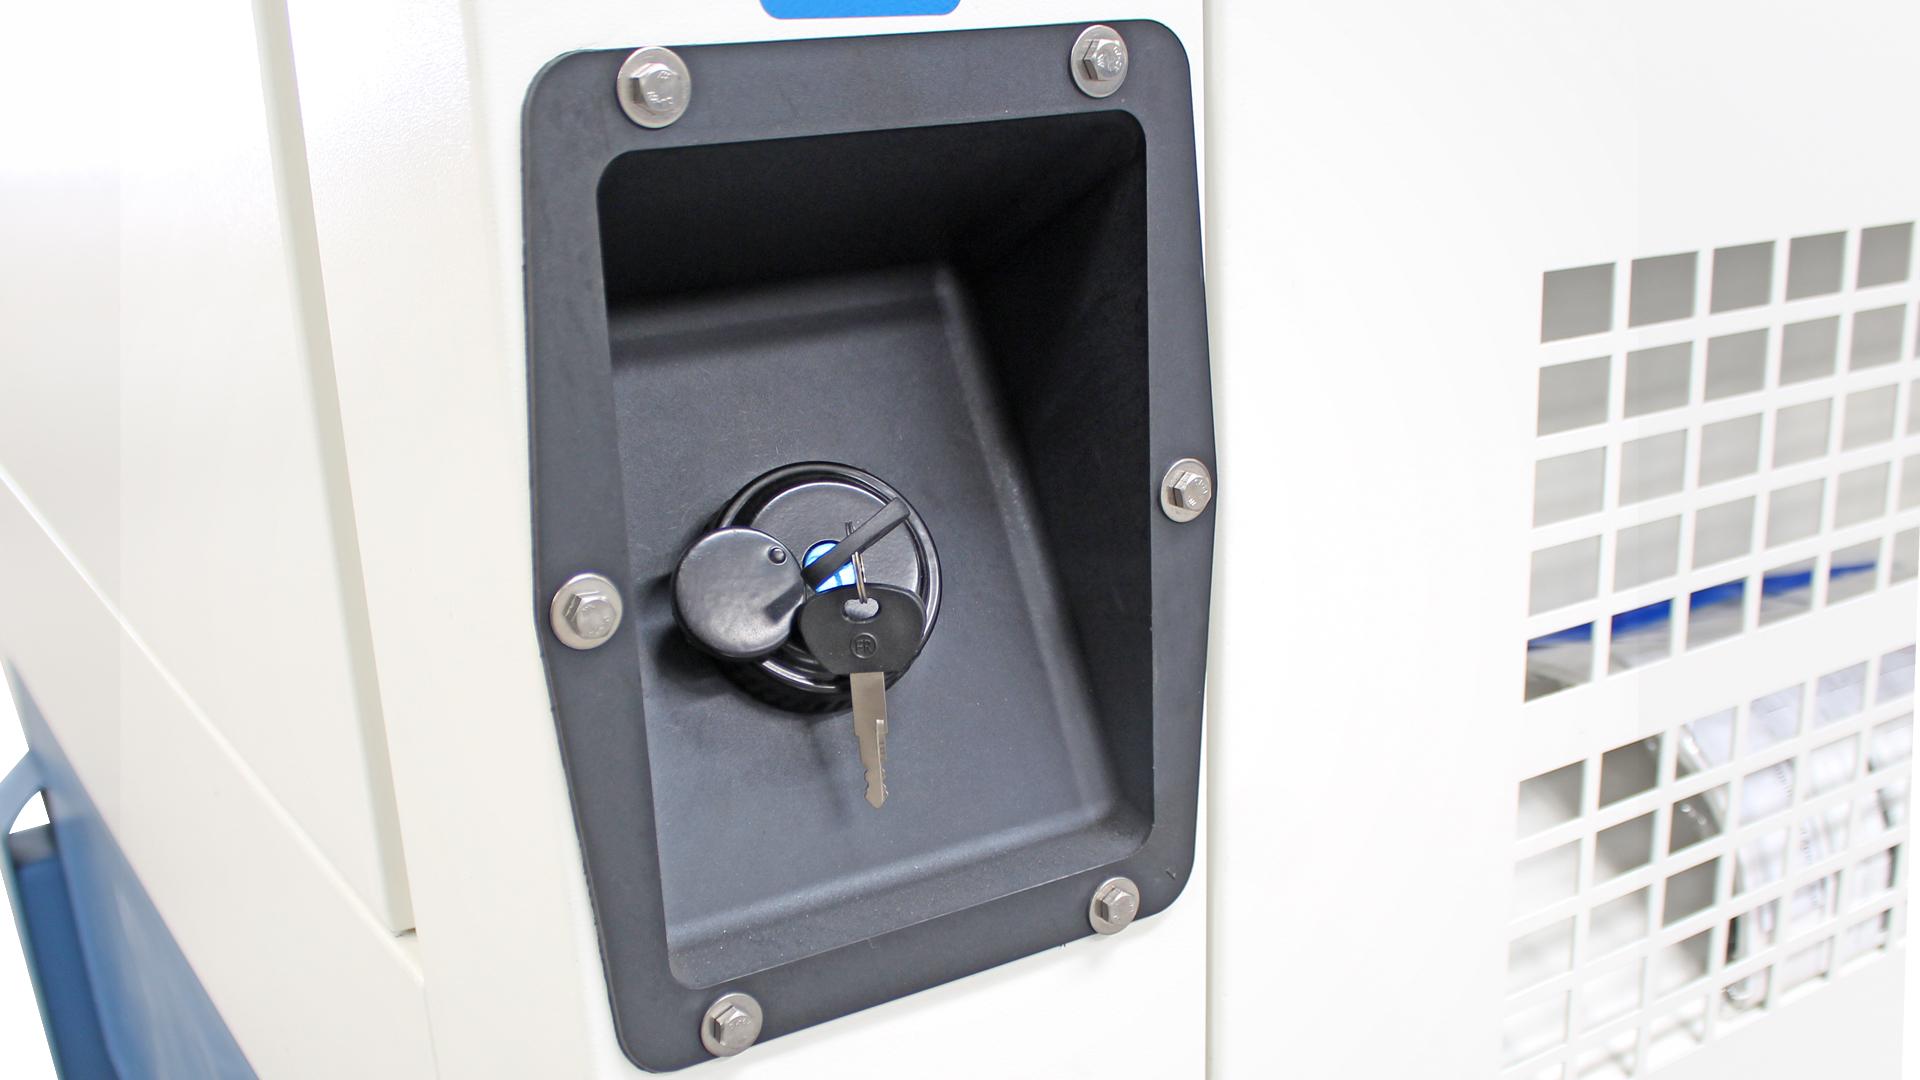 External Fuel Filler Cap on Evopower Cummins Diesel Generator